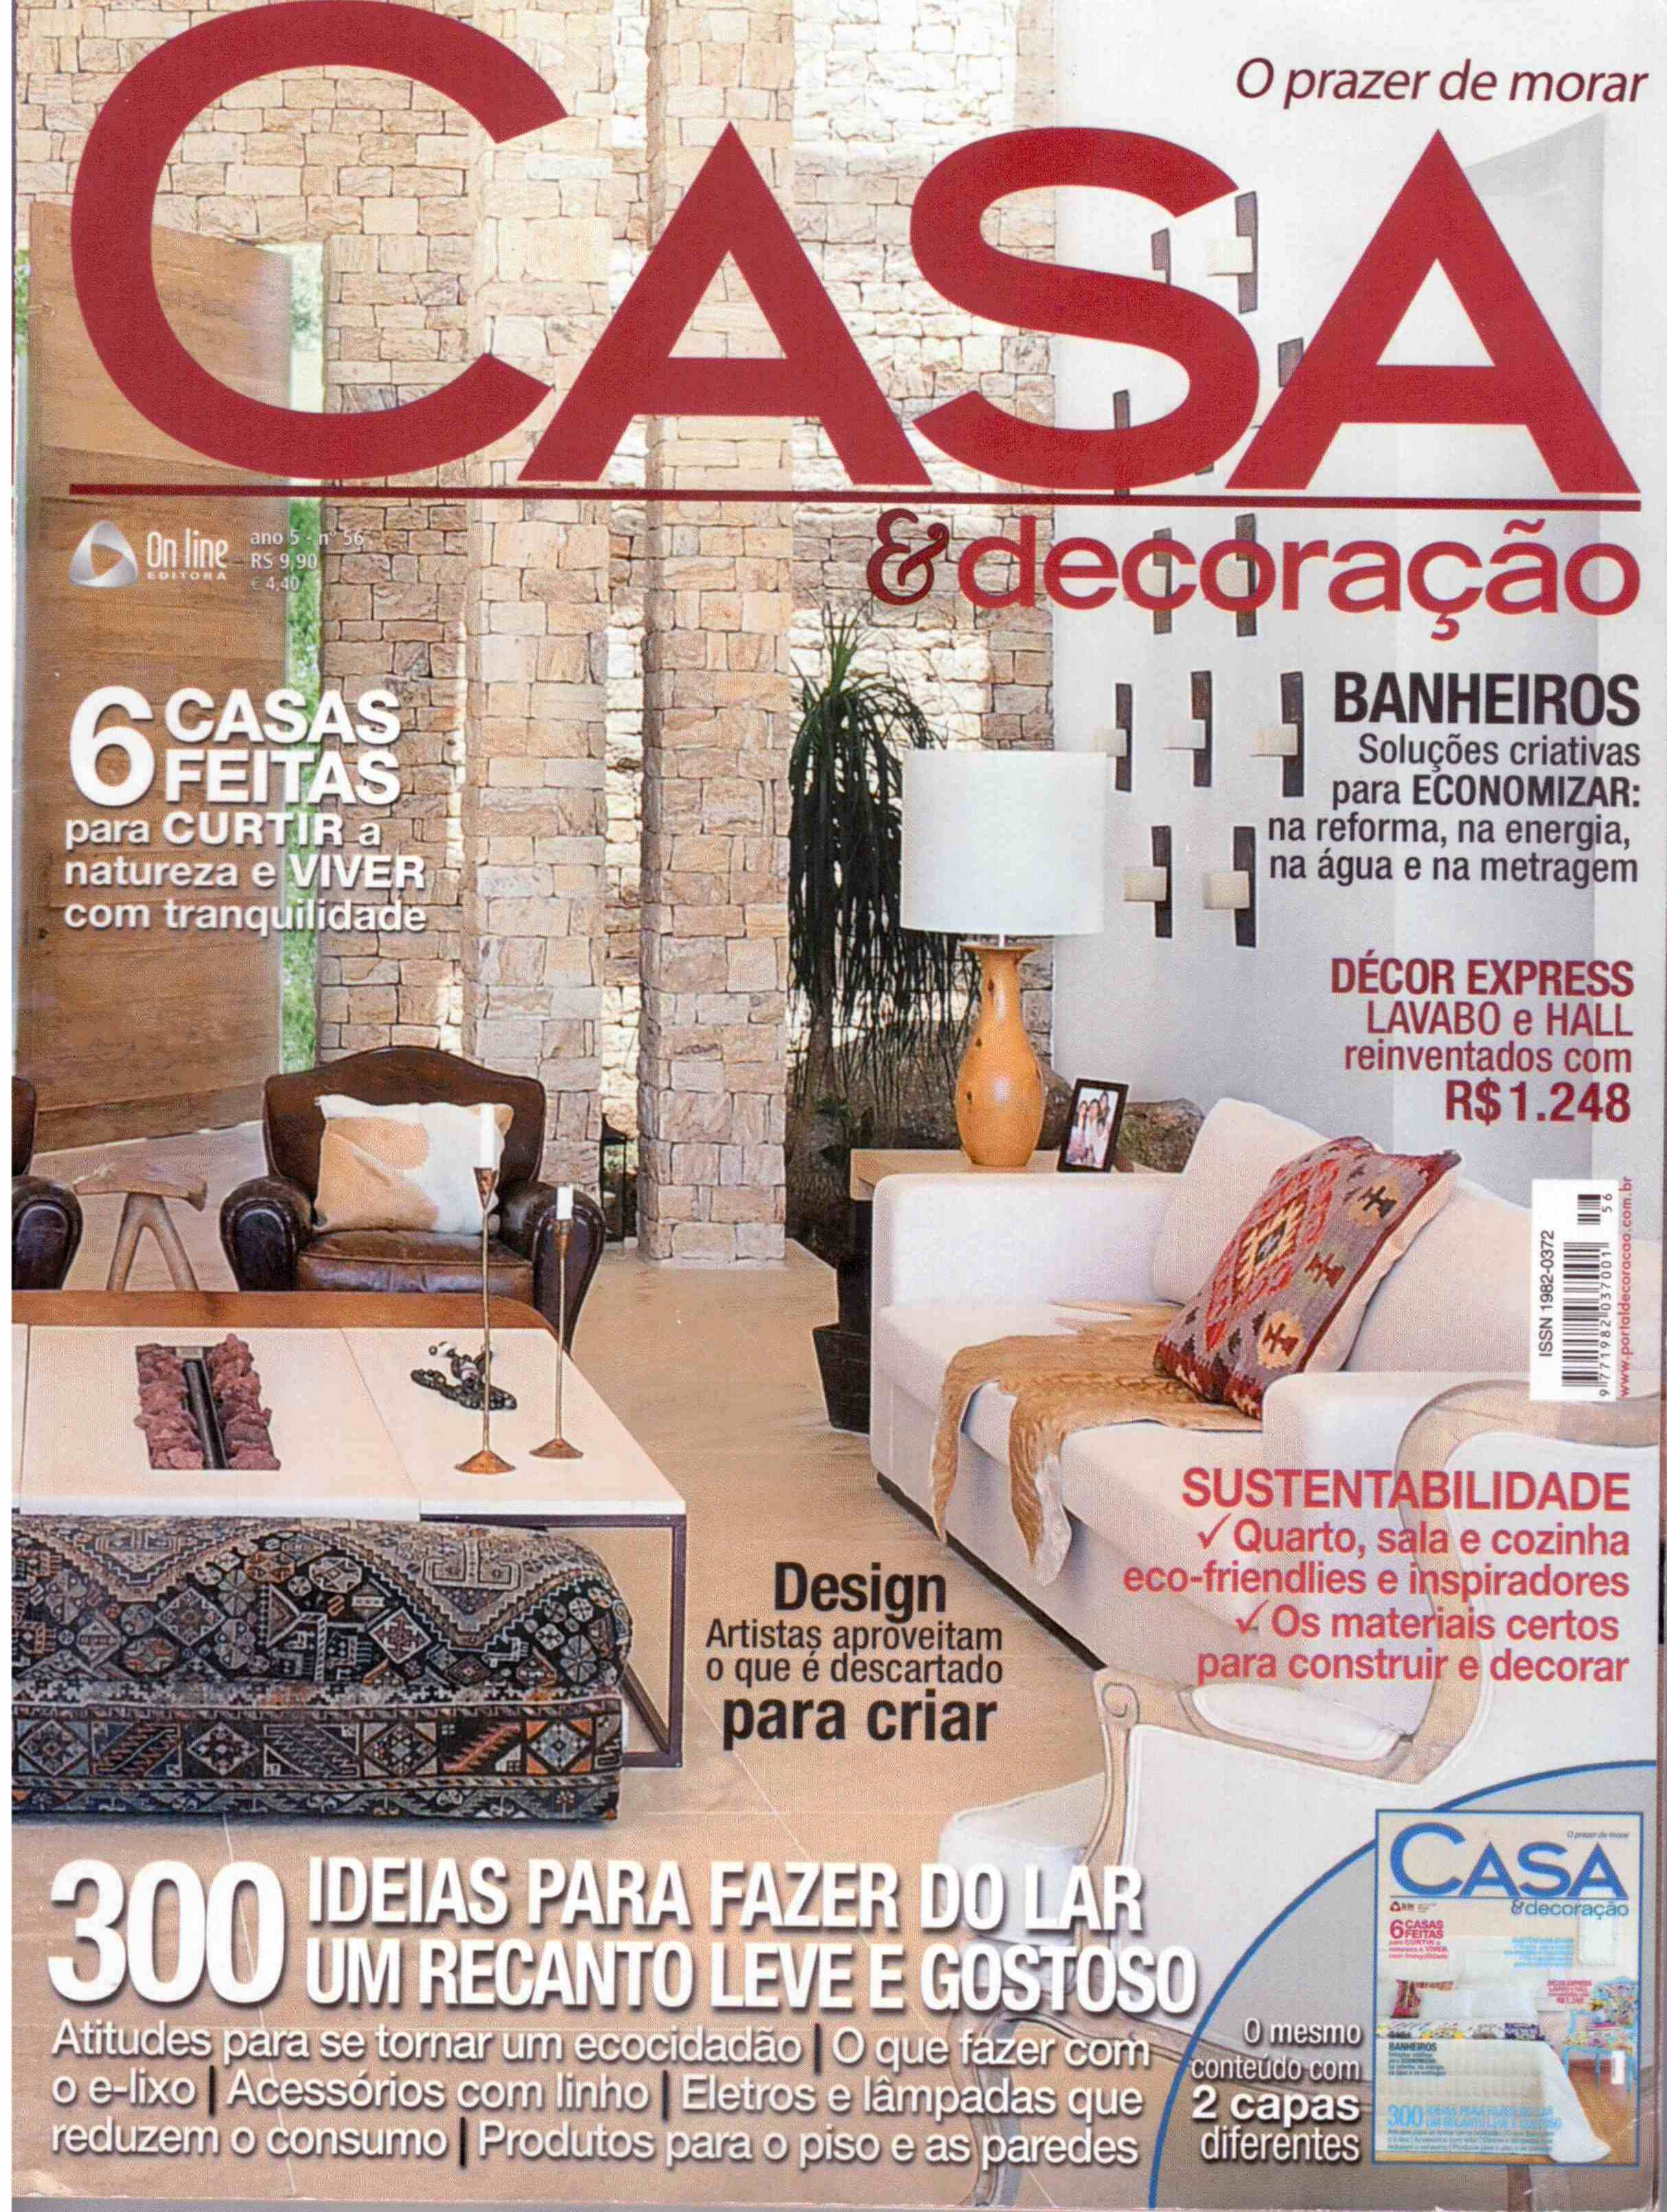 Revista de decoraci n cosas de casa home decor catalogs for Cosas de casa revista decoracion